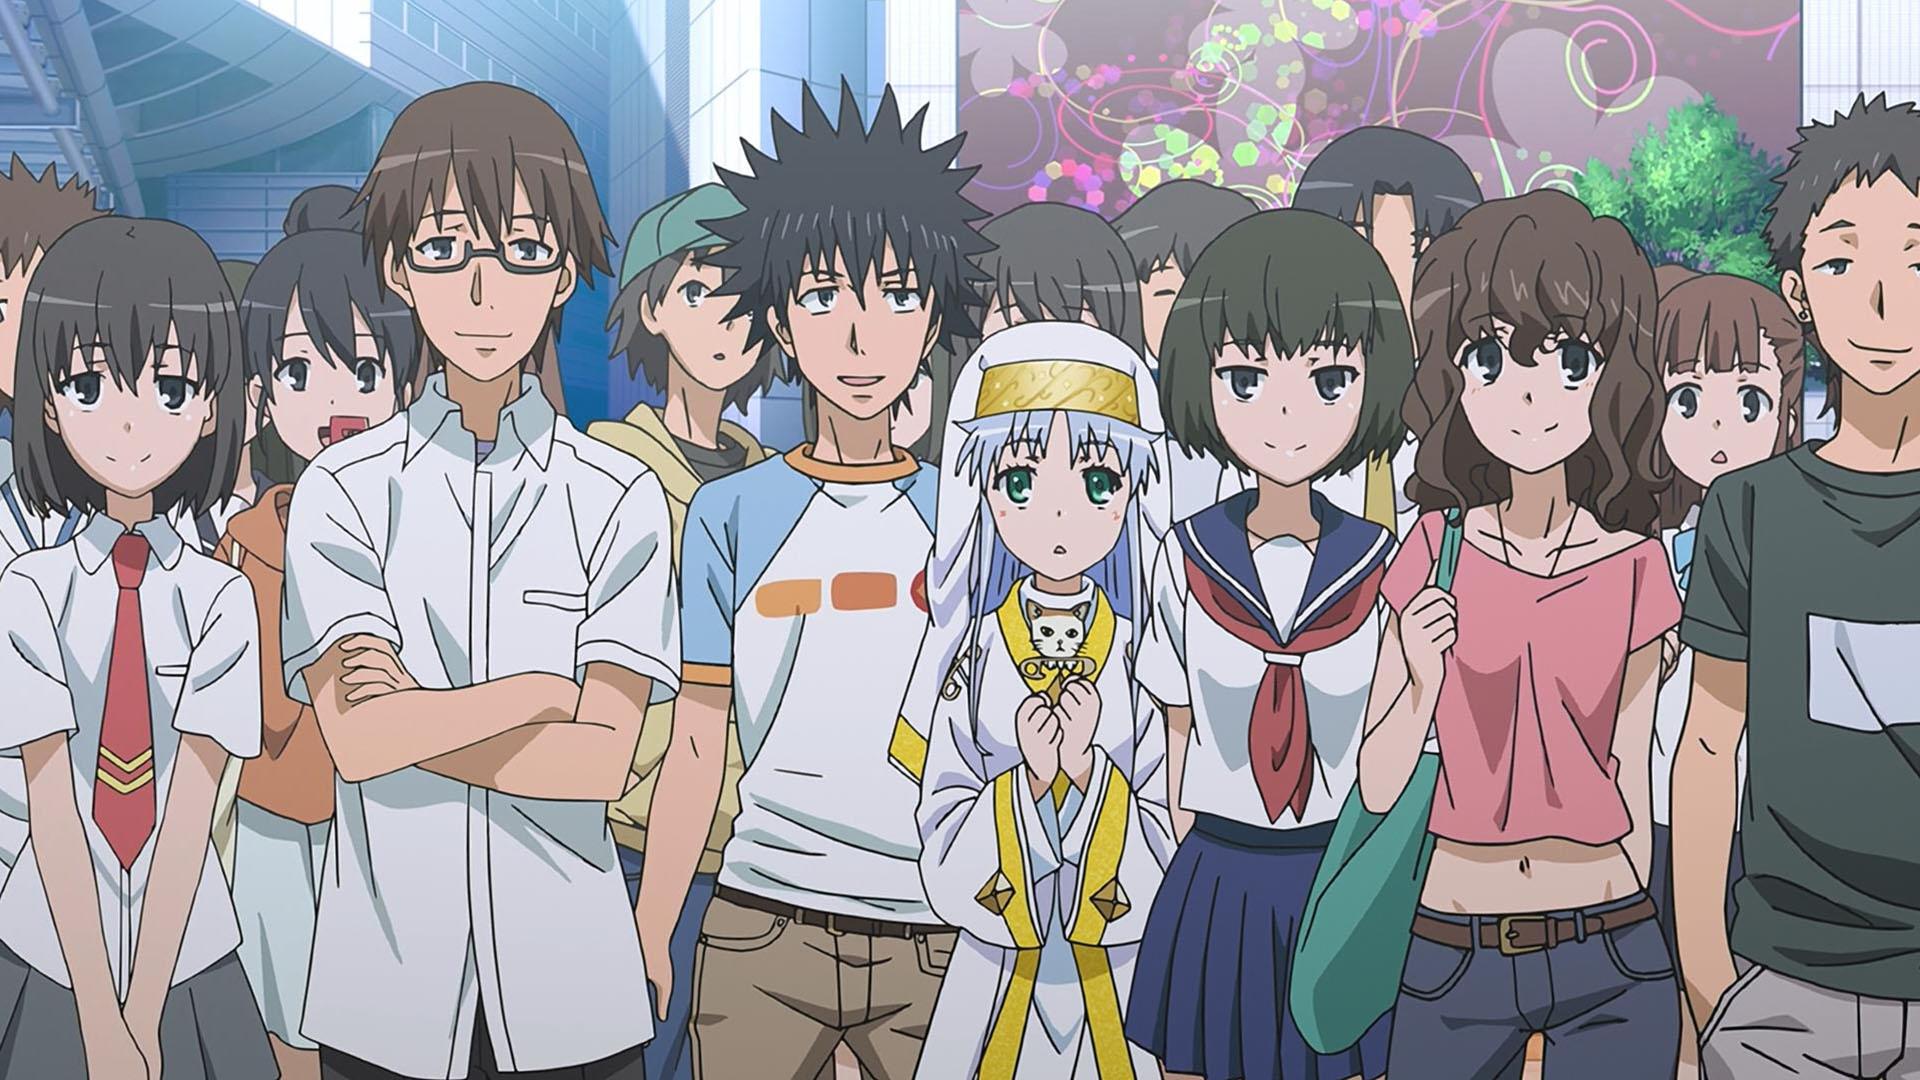 To aru Majutsu no Index : Endymion no Kiseki OST - Over (Extended)